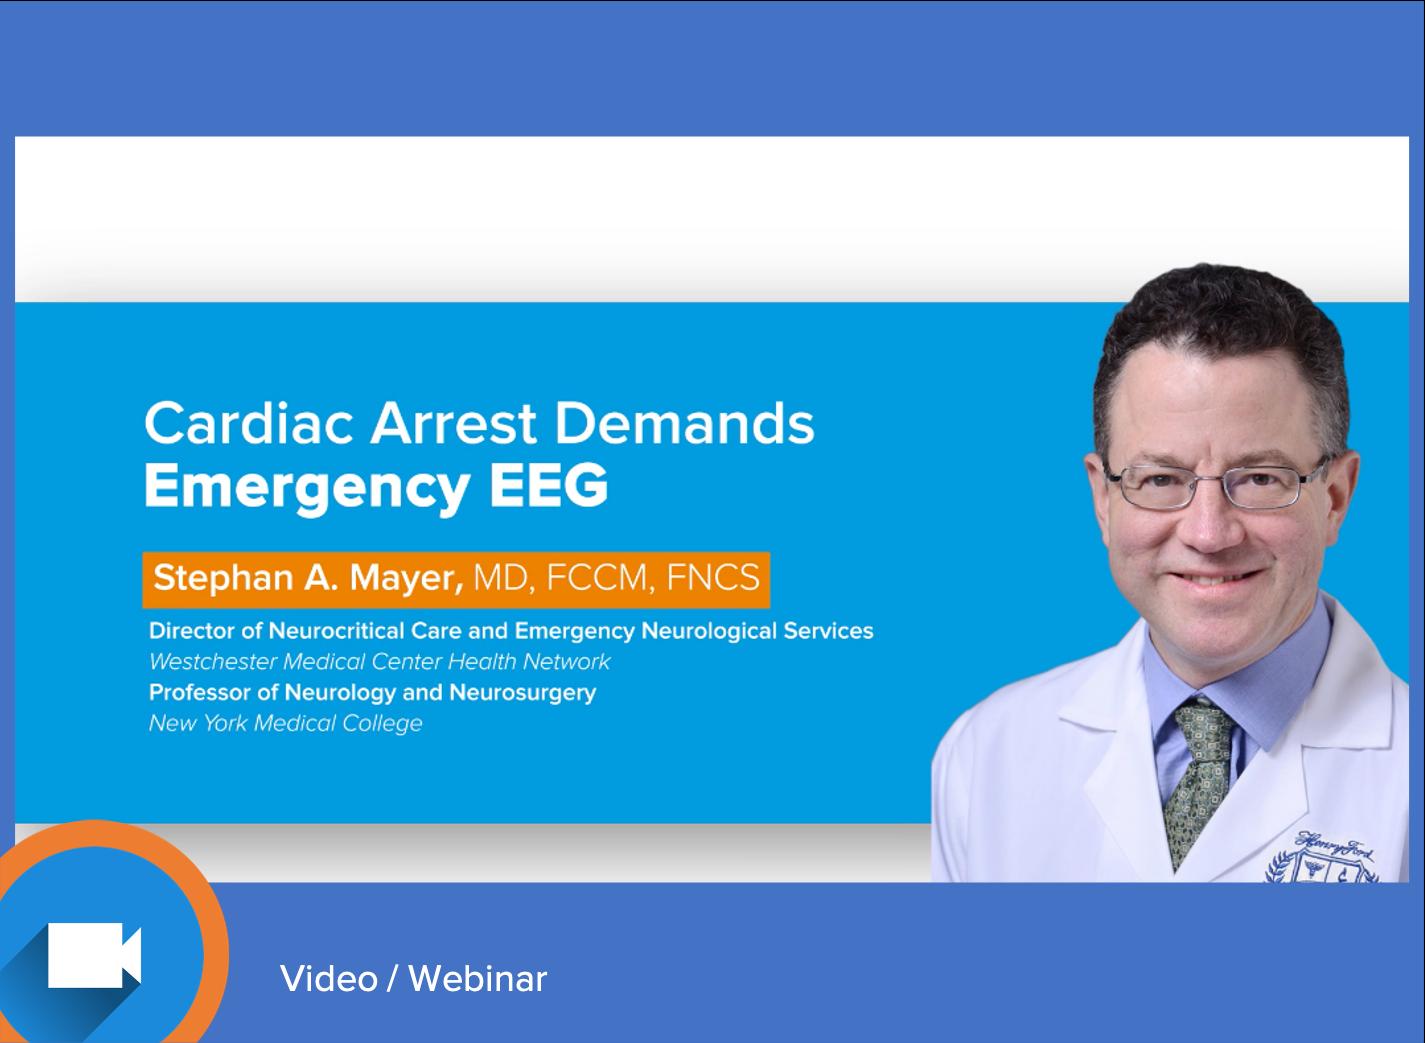 Cardiac Arrest Demands Emergency EEG